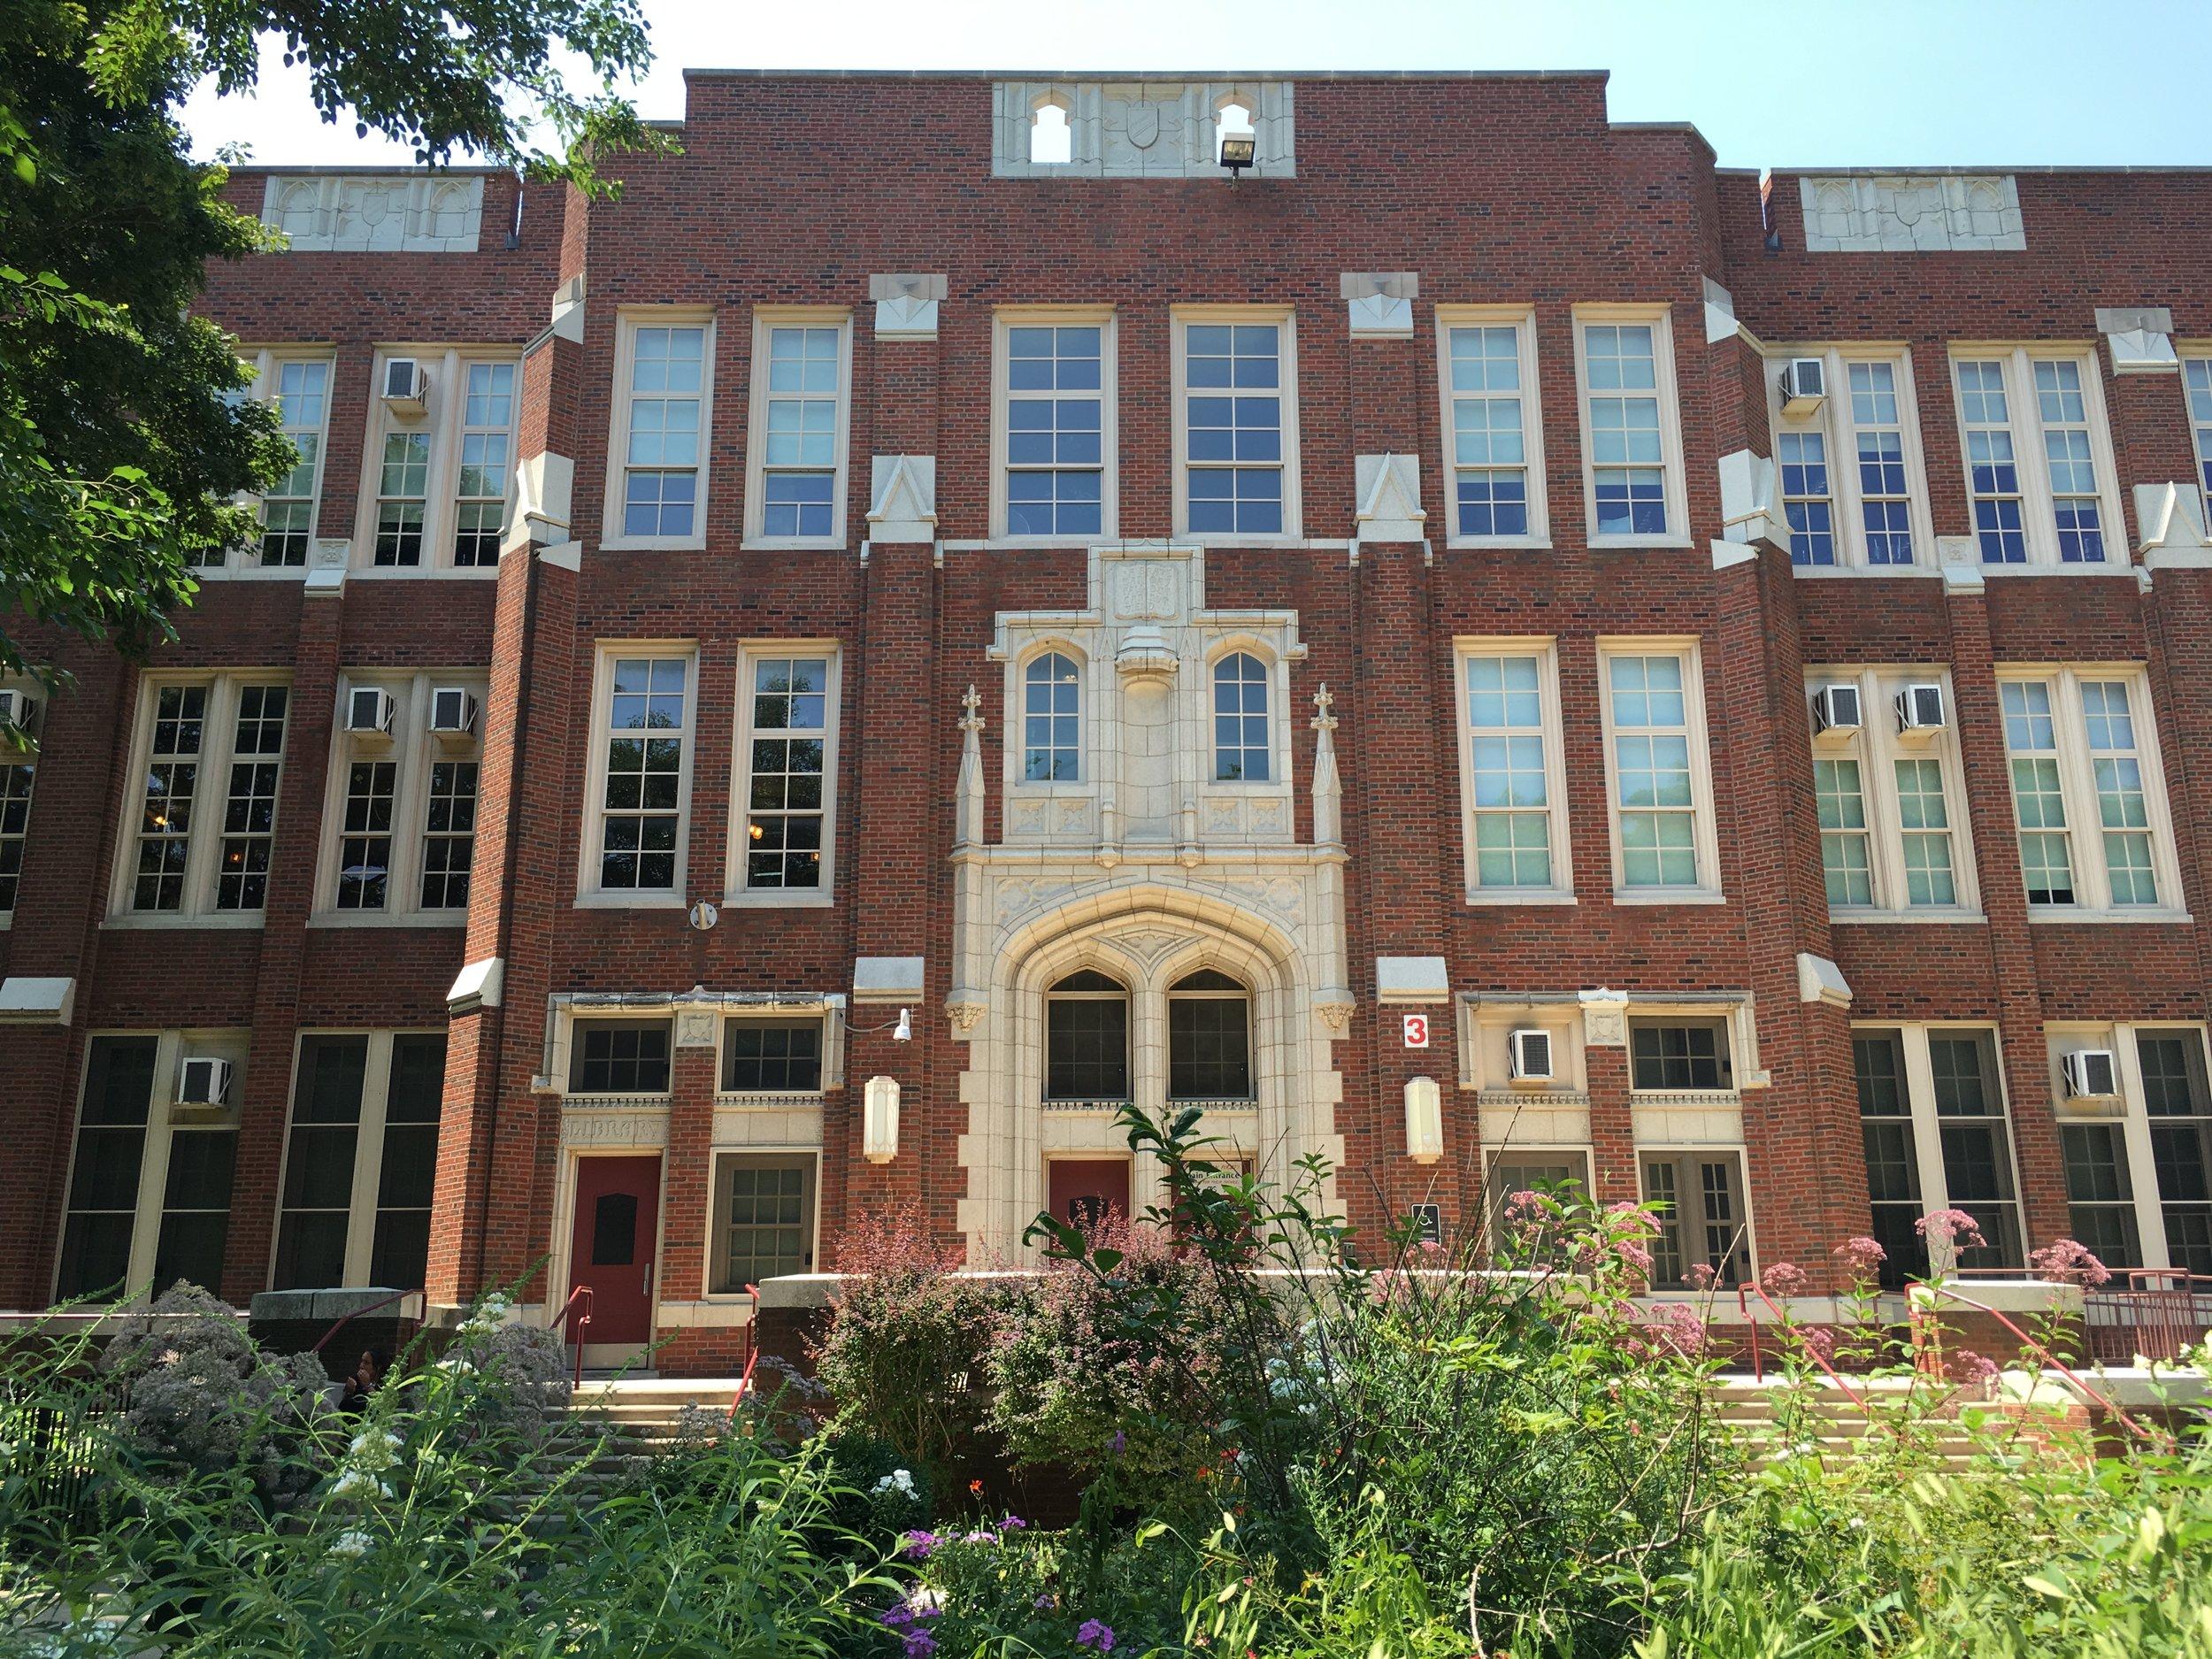 Level 1 High School Offers Honors, AP, and Dual Credit classes beginning Freshman Year IB Program